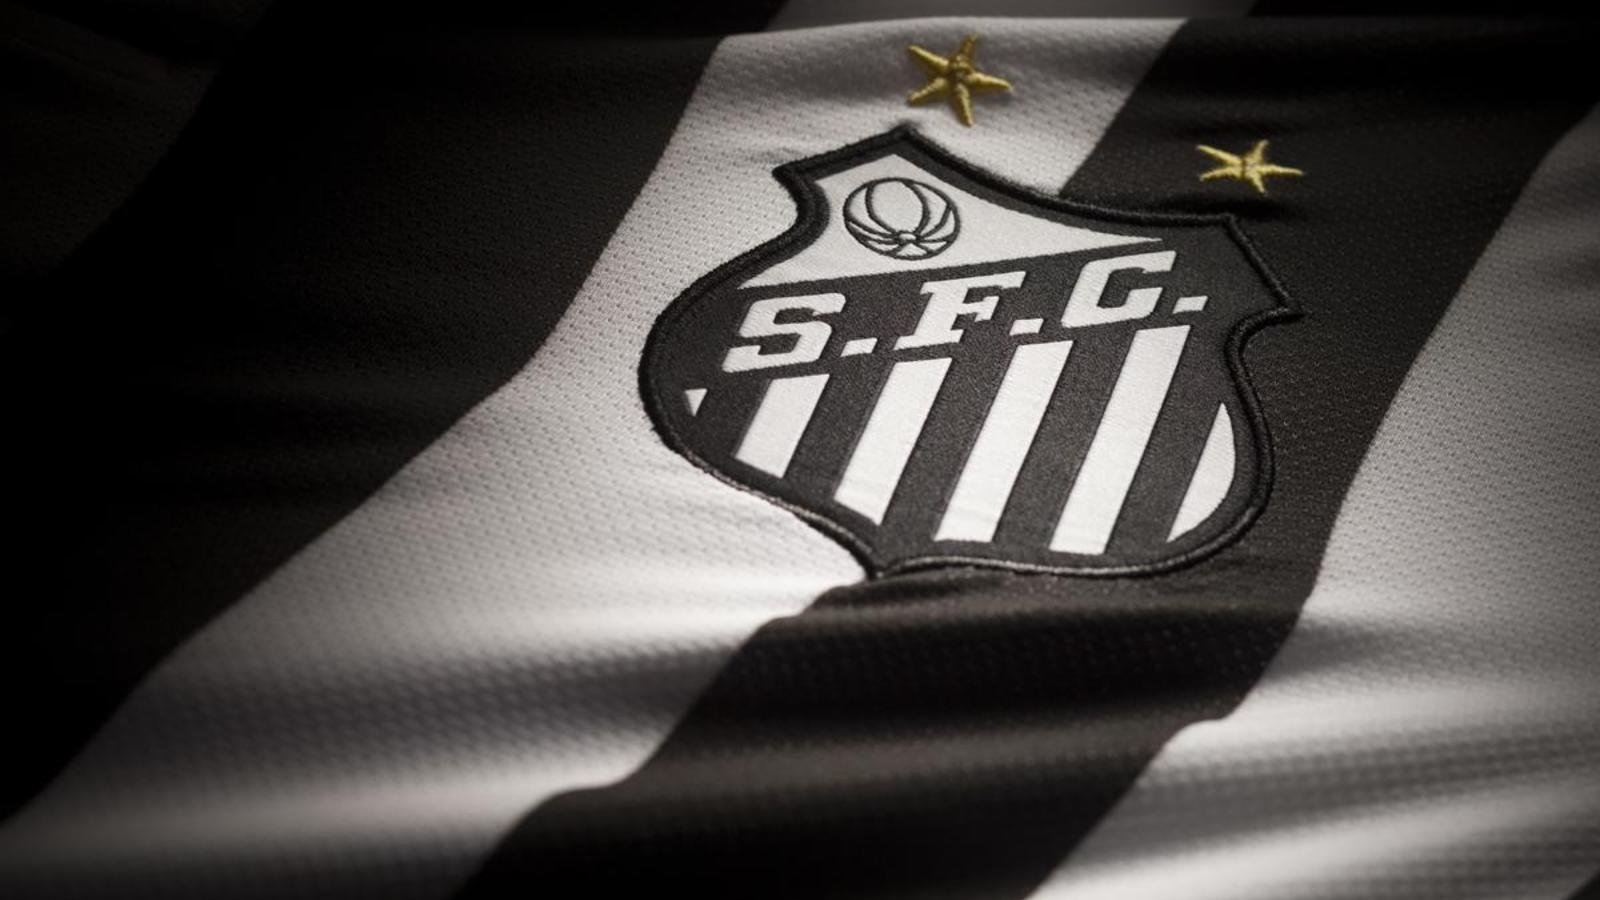 santos futebol clube wallpaper 1600x900